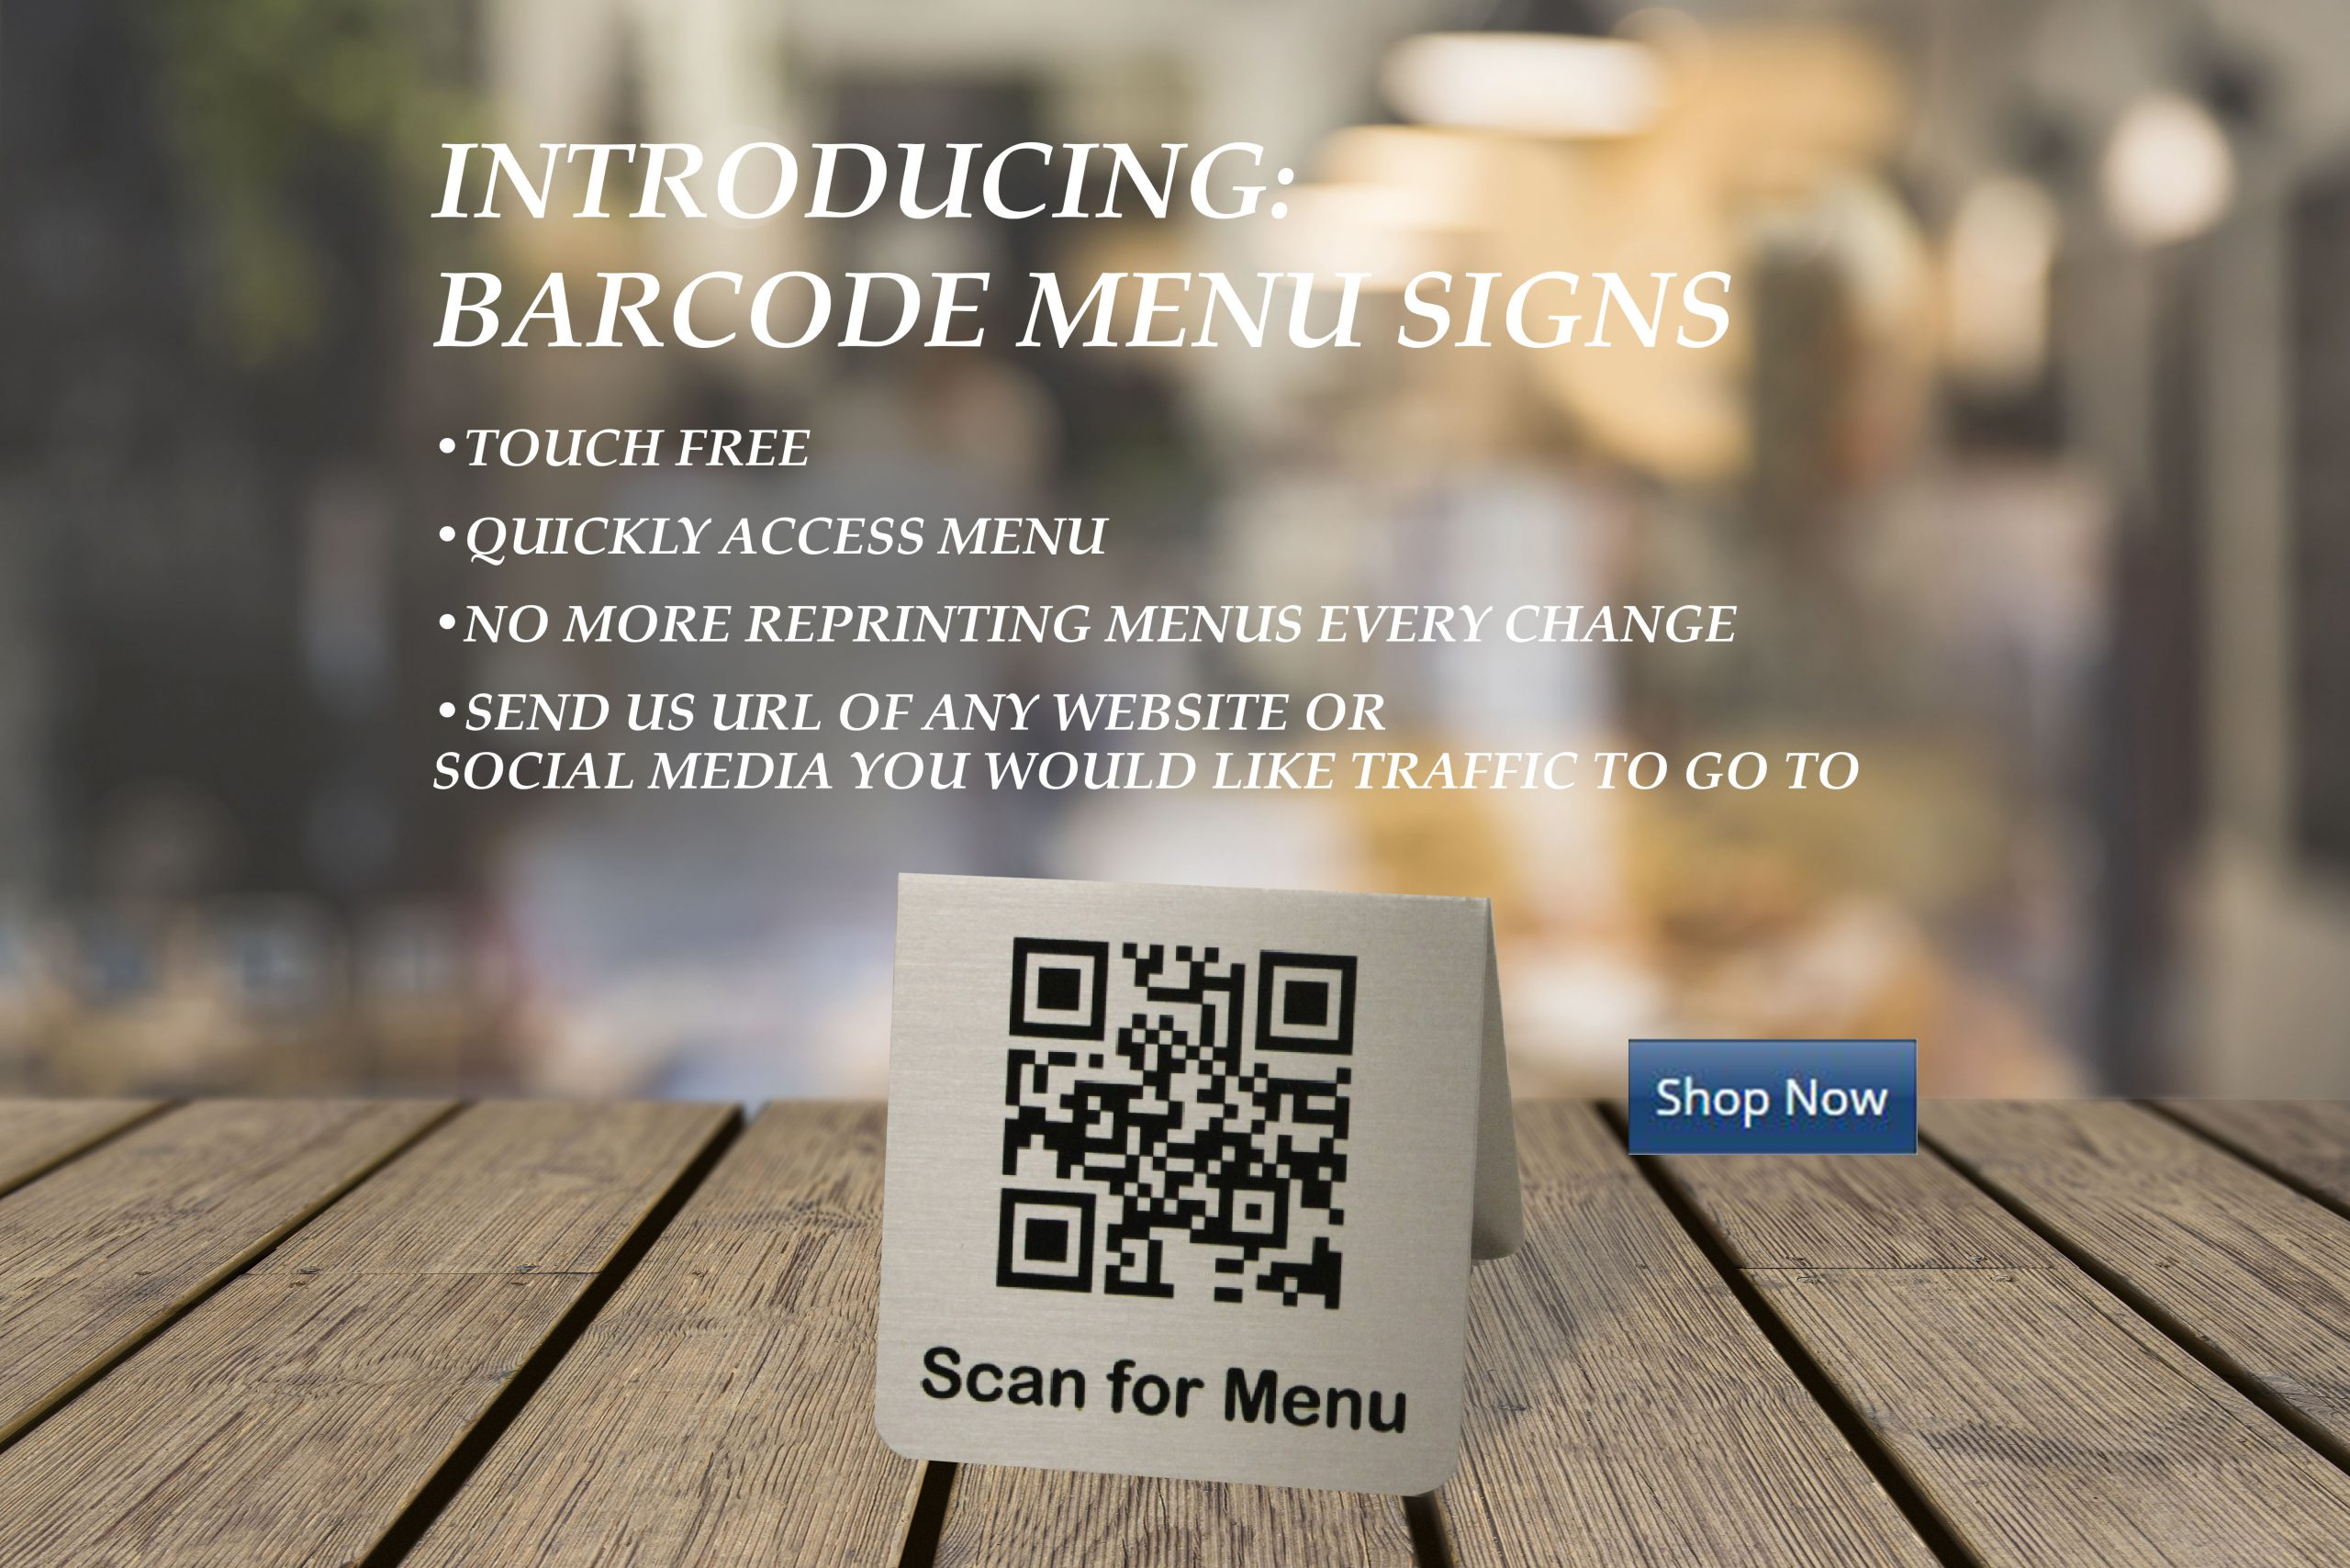 barcode menu